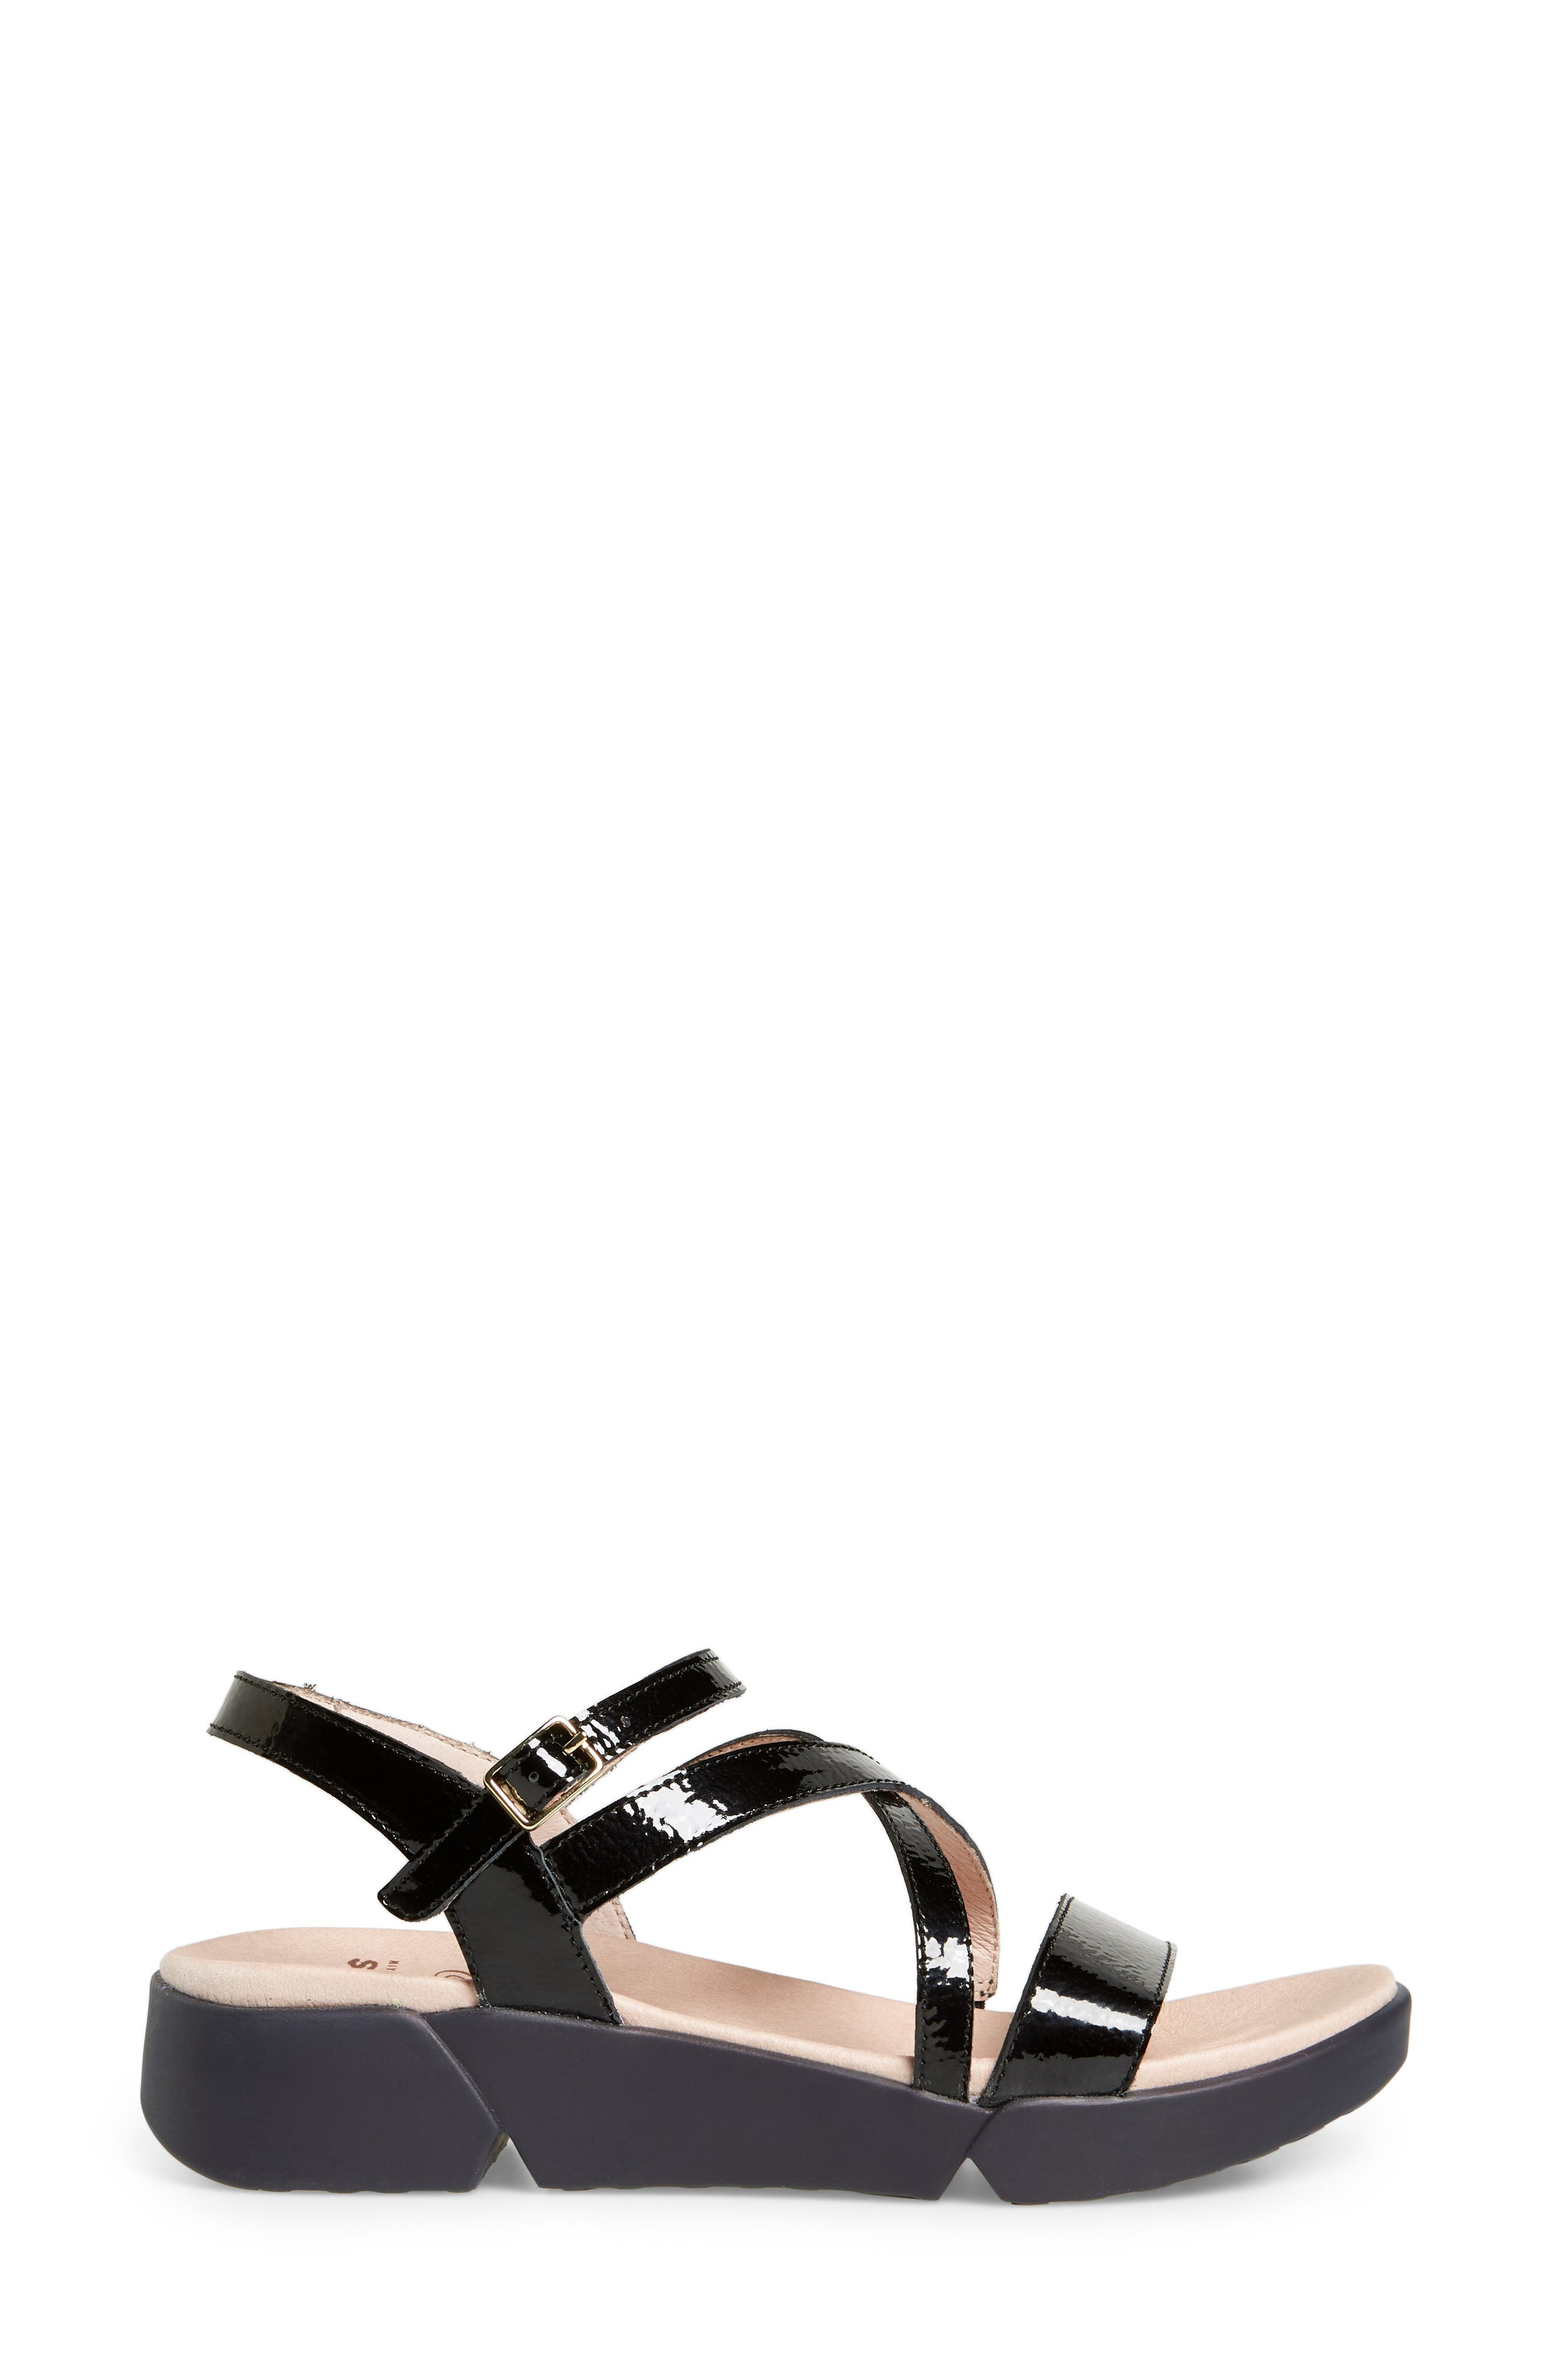 Wedge Sandal,                             Alternate thumbnail 3, color,                             BLACK PATENT LEATHER